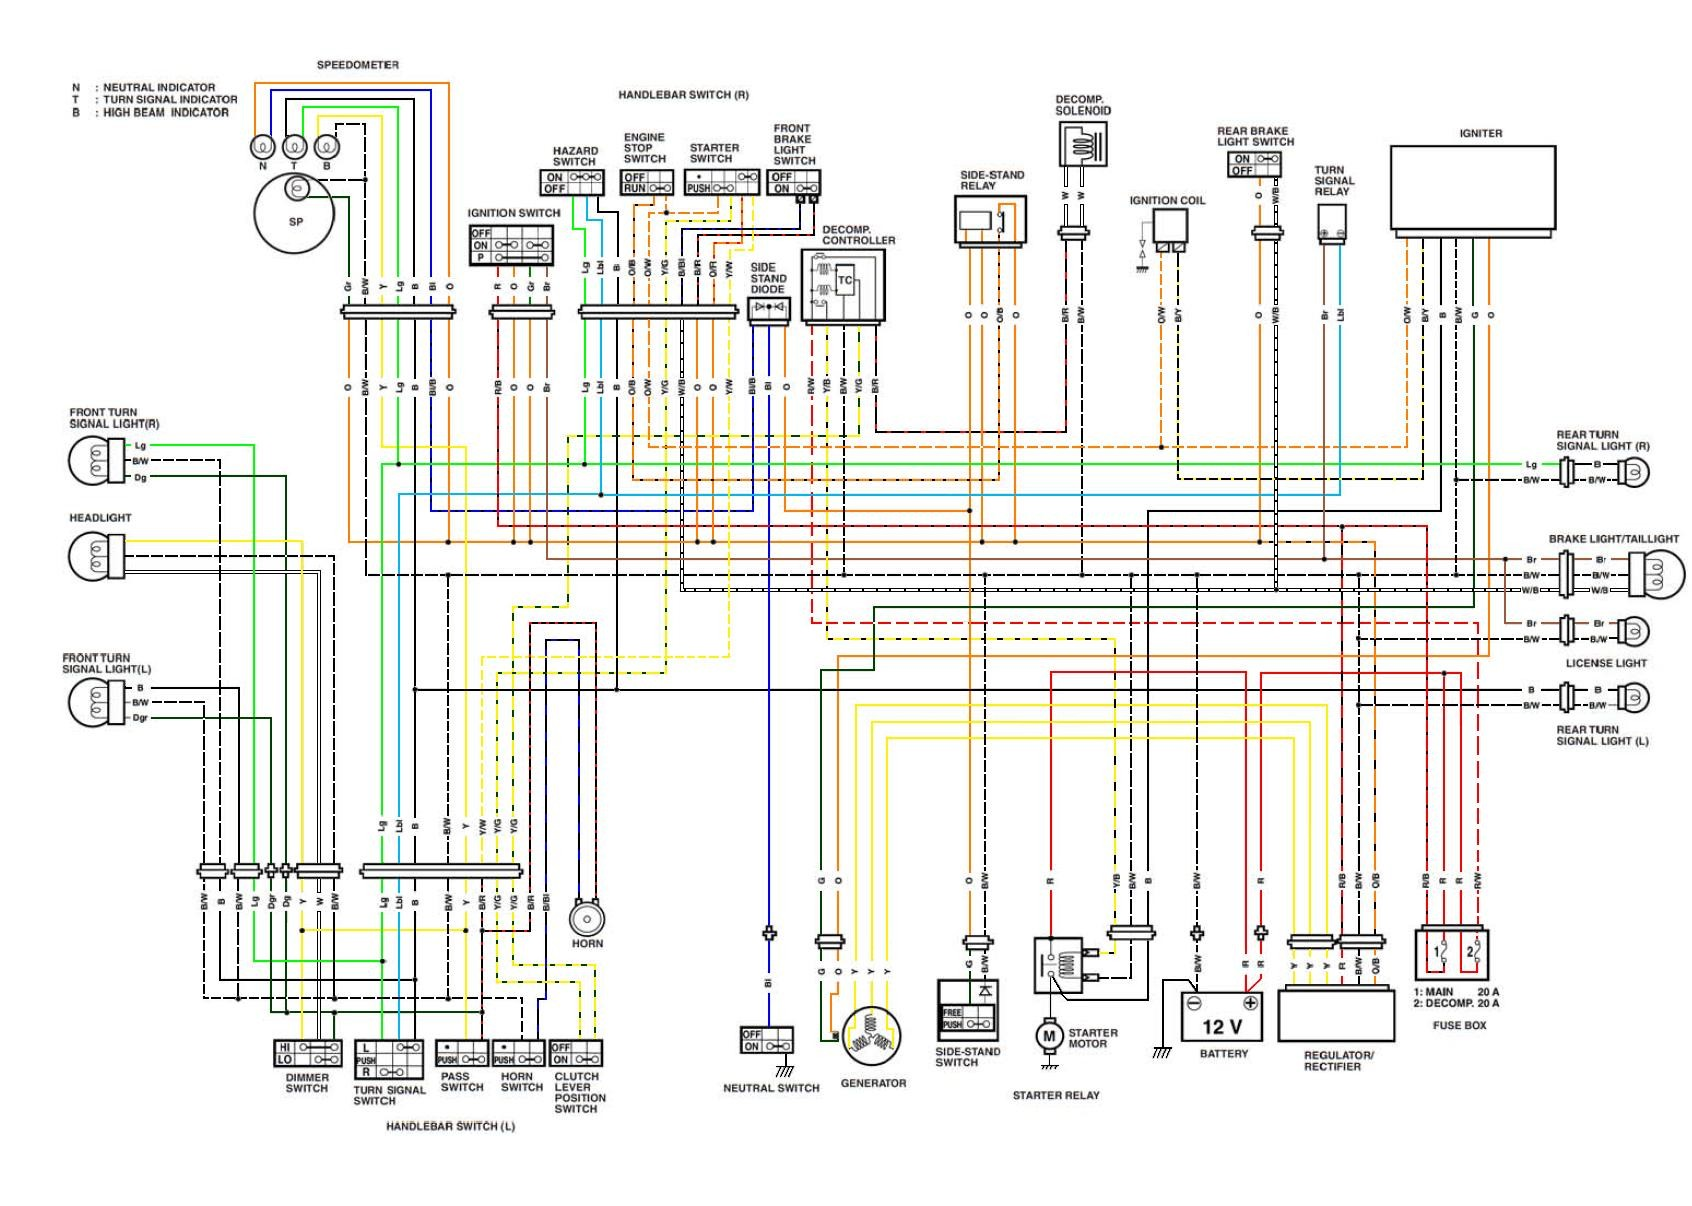 hight resolution of harley davidson wiring diagram download wiring diagram image 1974 harley davidson flh